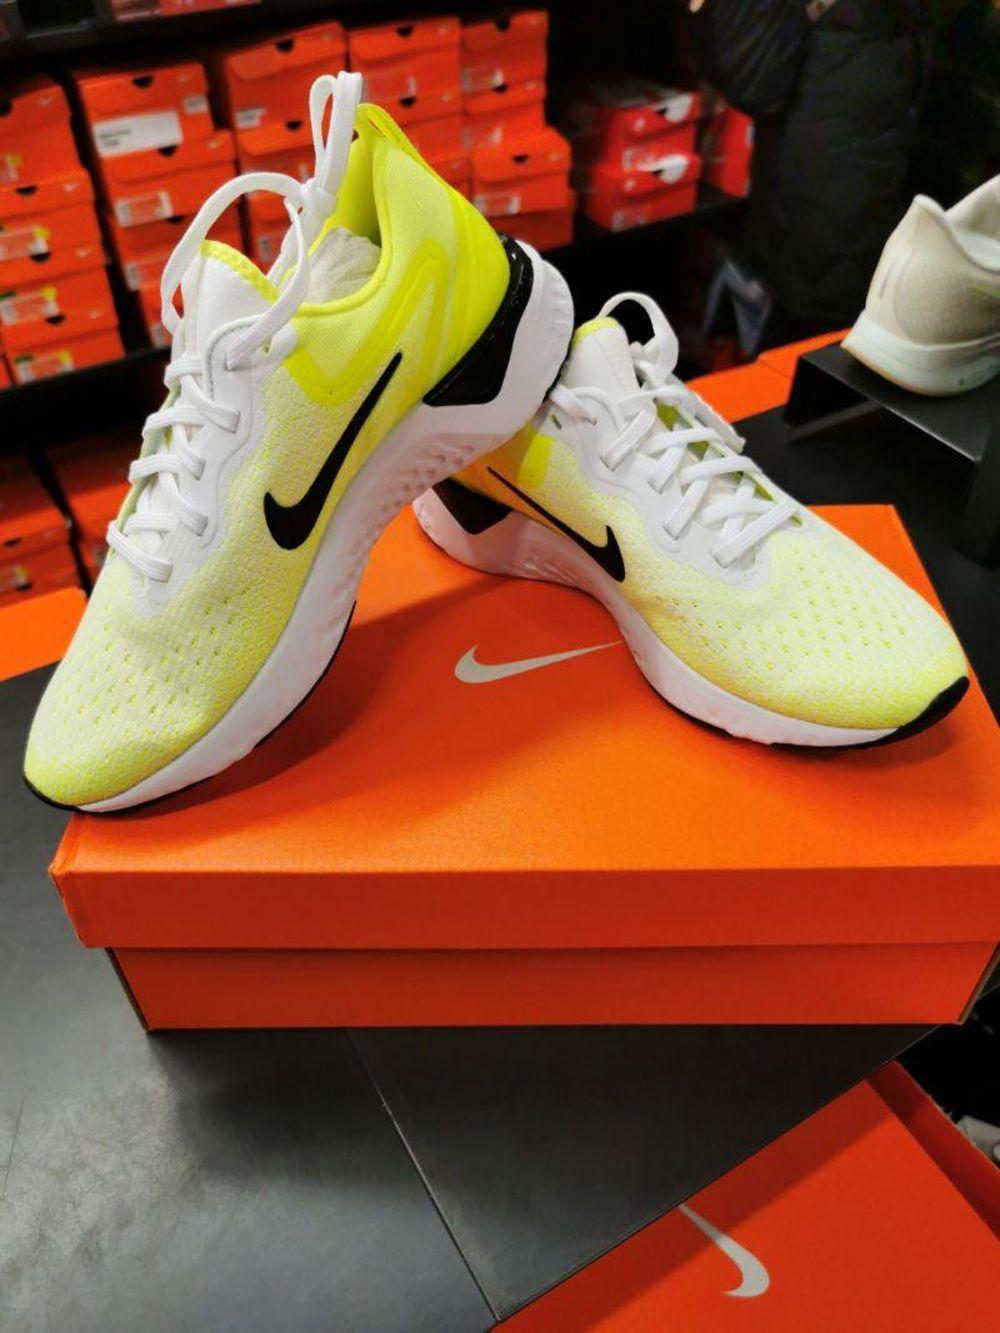 Nike Free Run 超轻 柔软 室内运动 跑步鞋 休闲鞋 徒步鞋 运动鞋